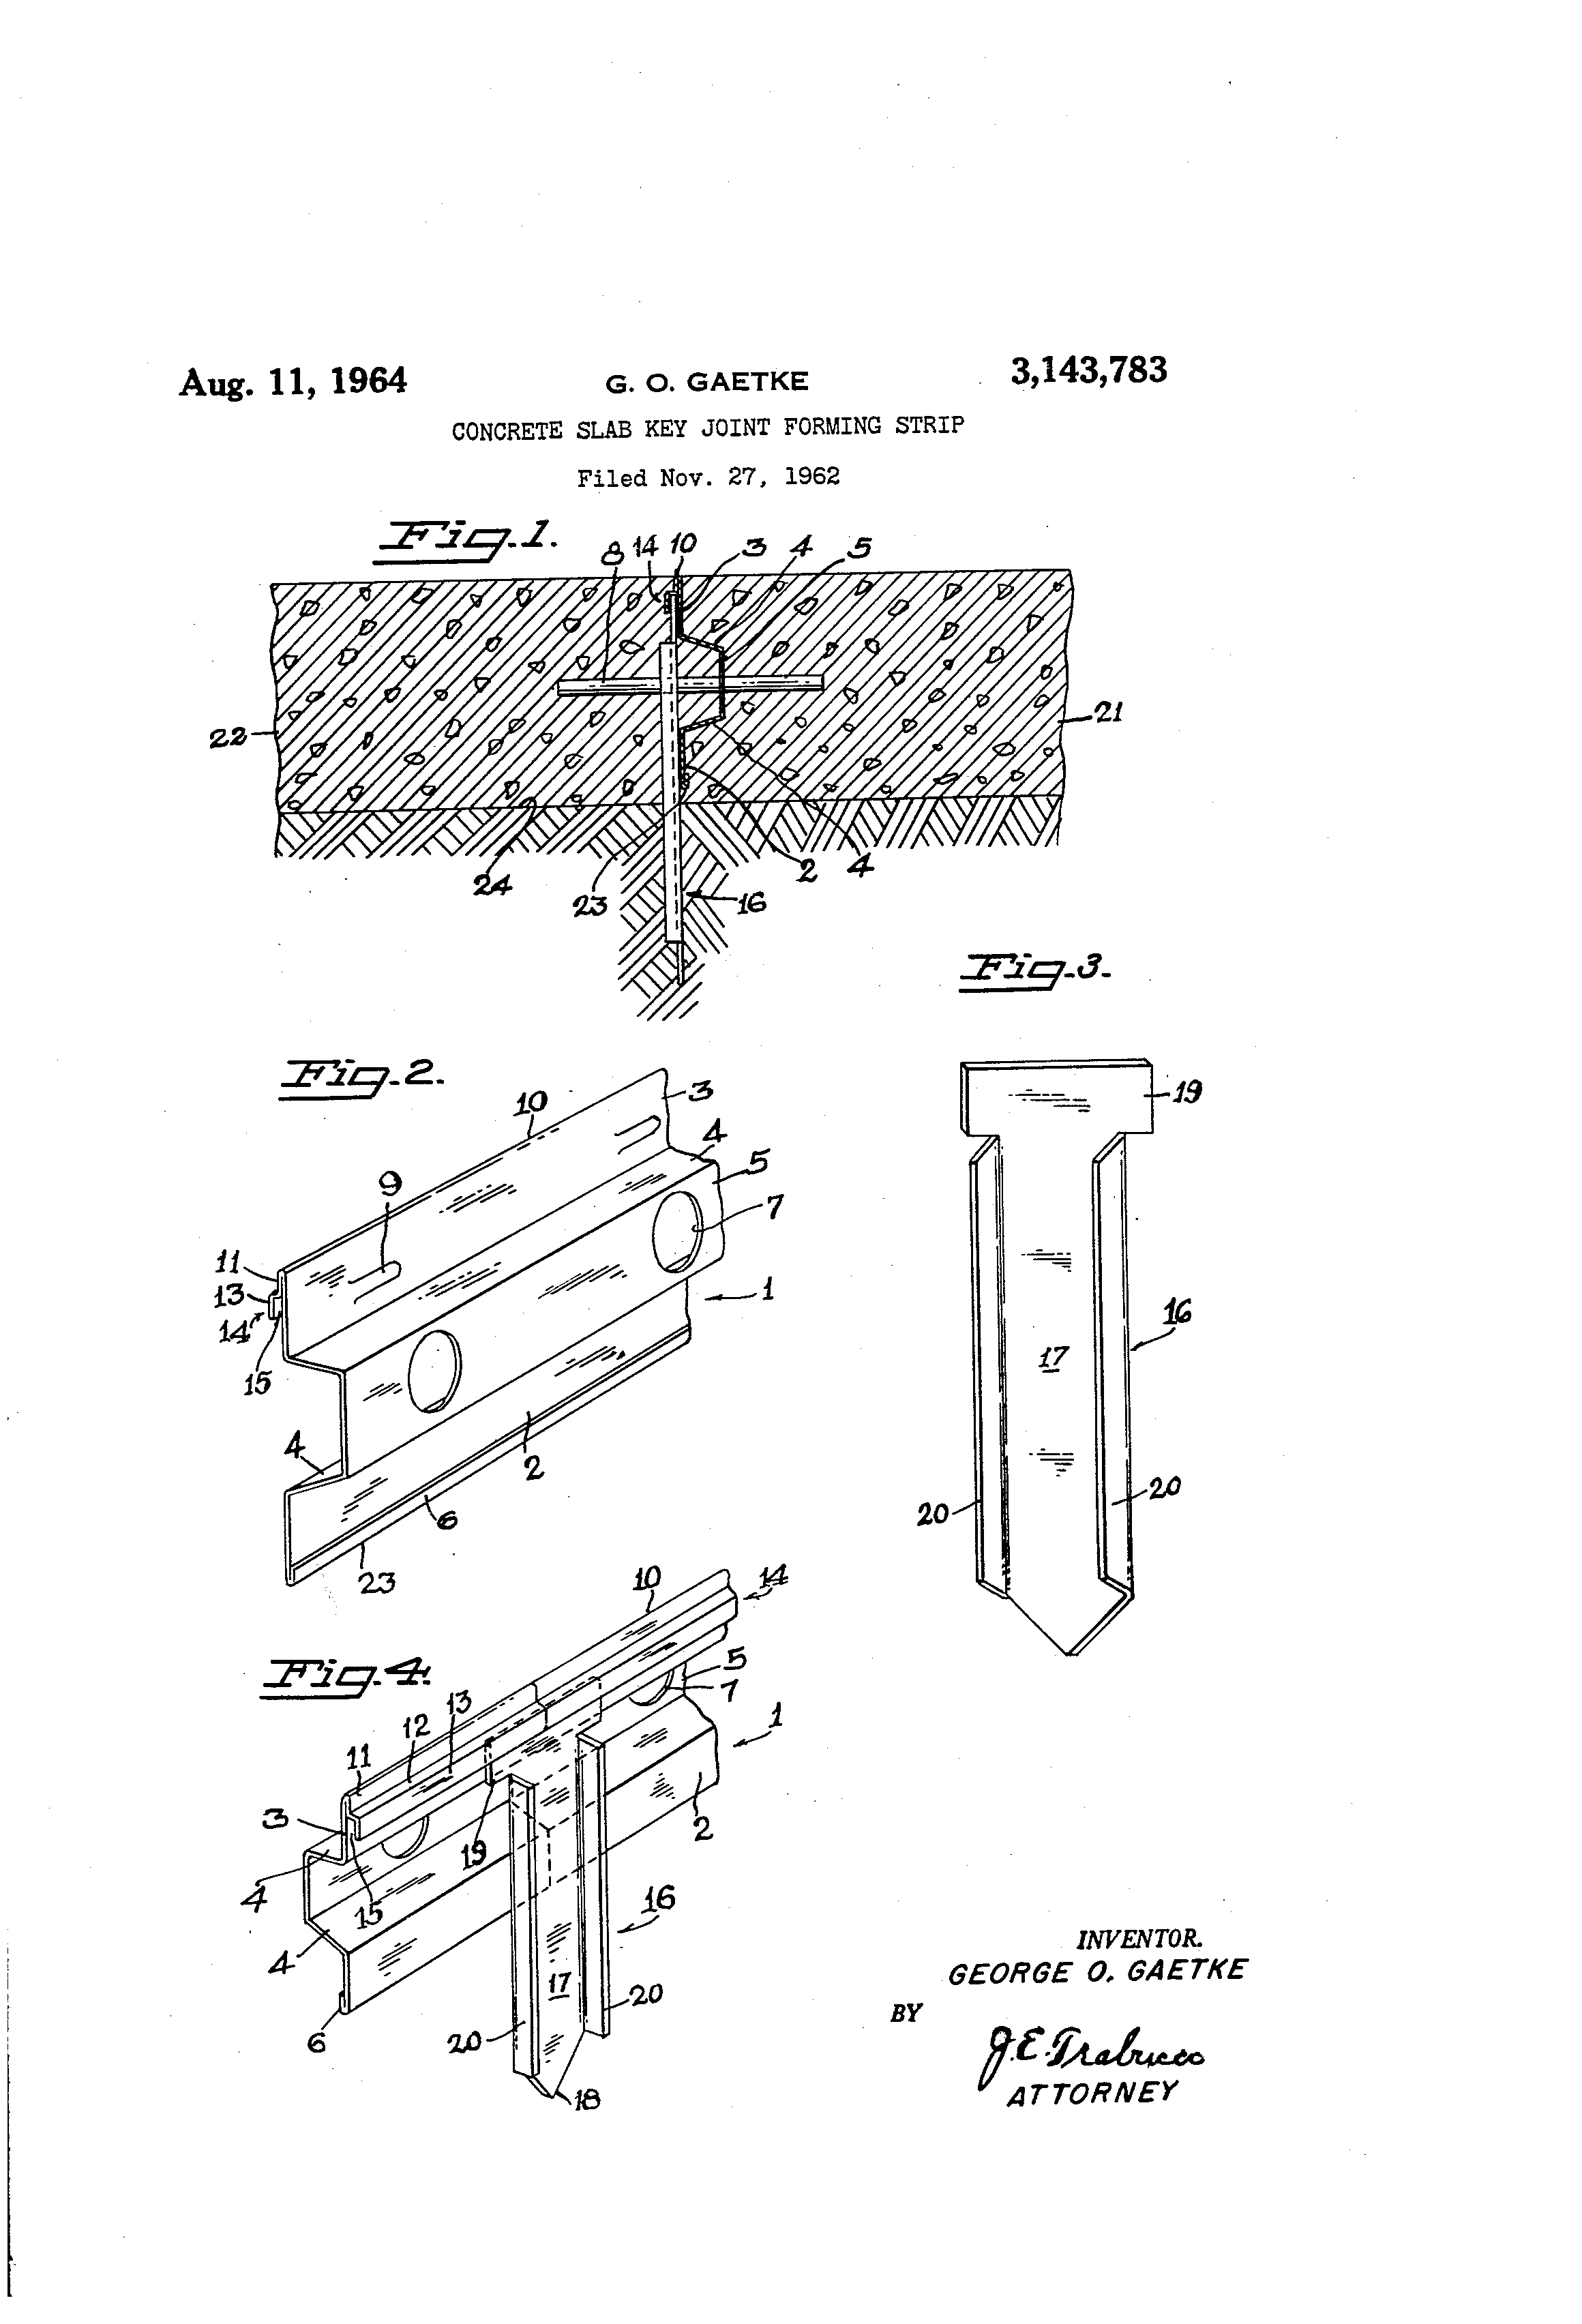 Joint Key Concrete : Patent us concrete slab key joint forming strip